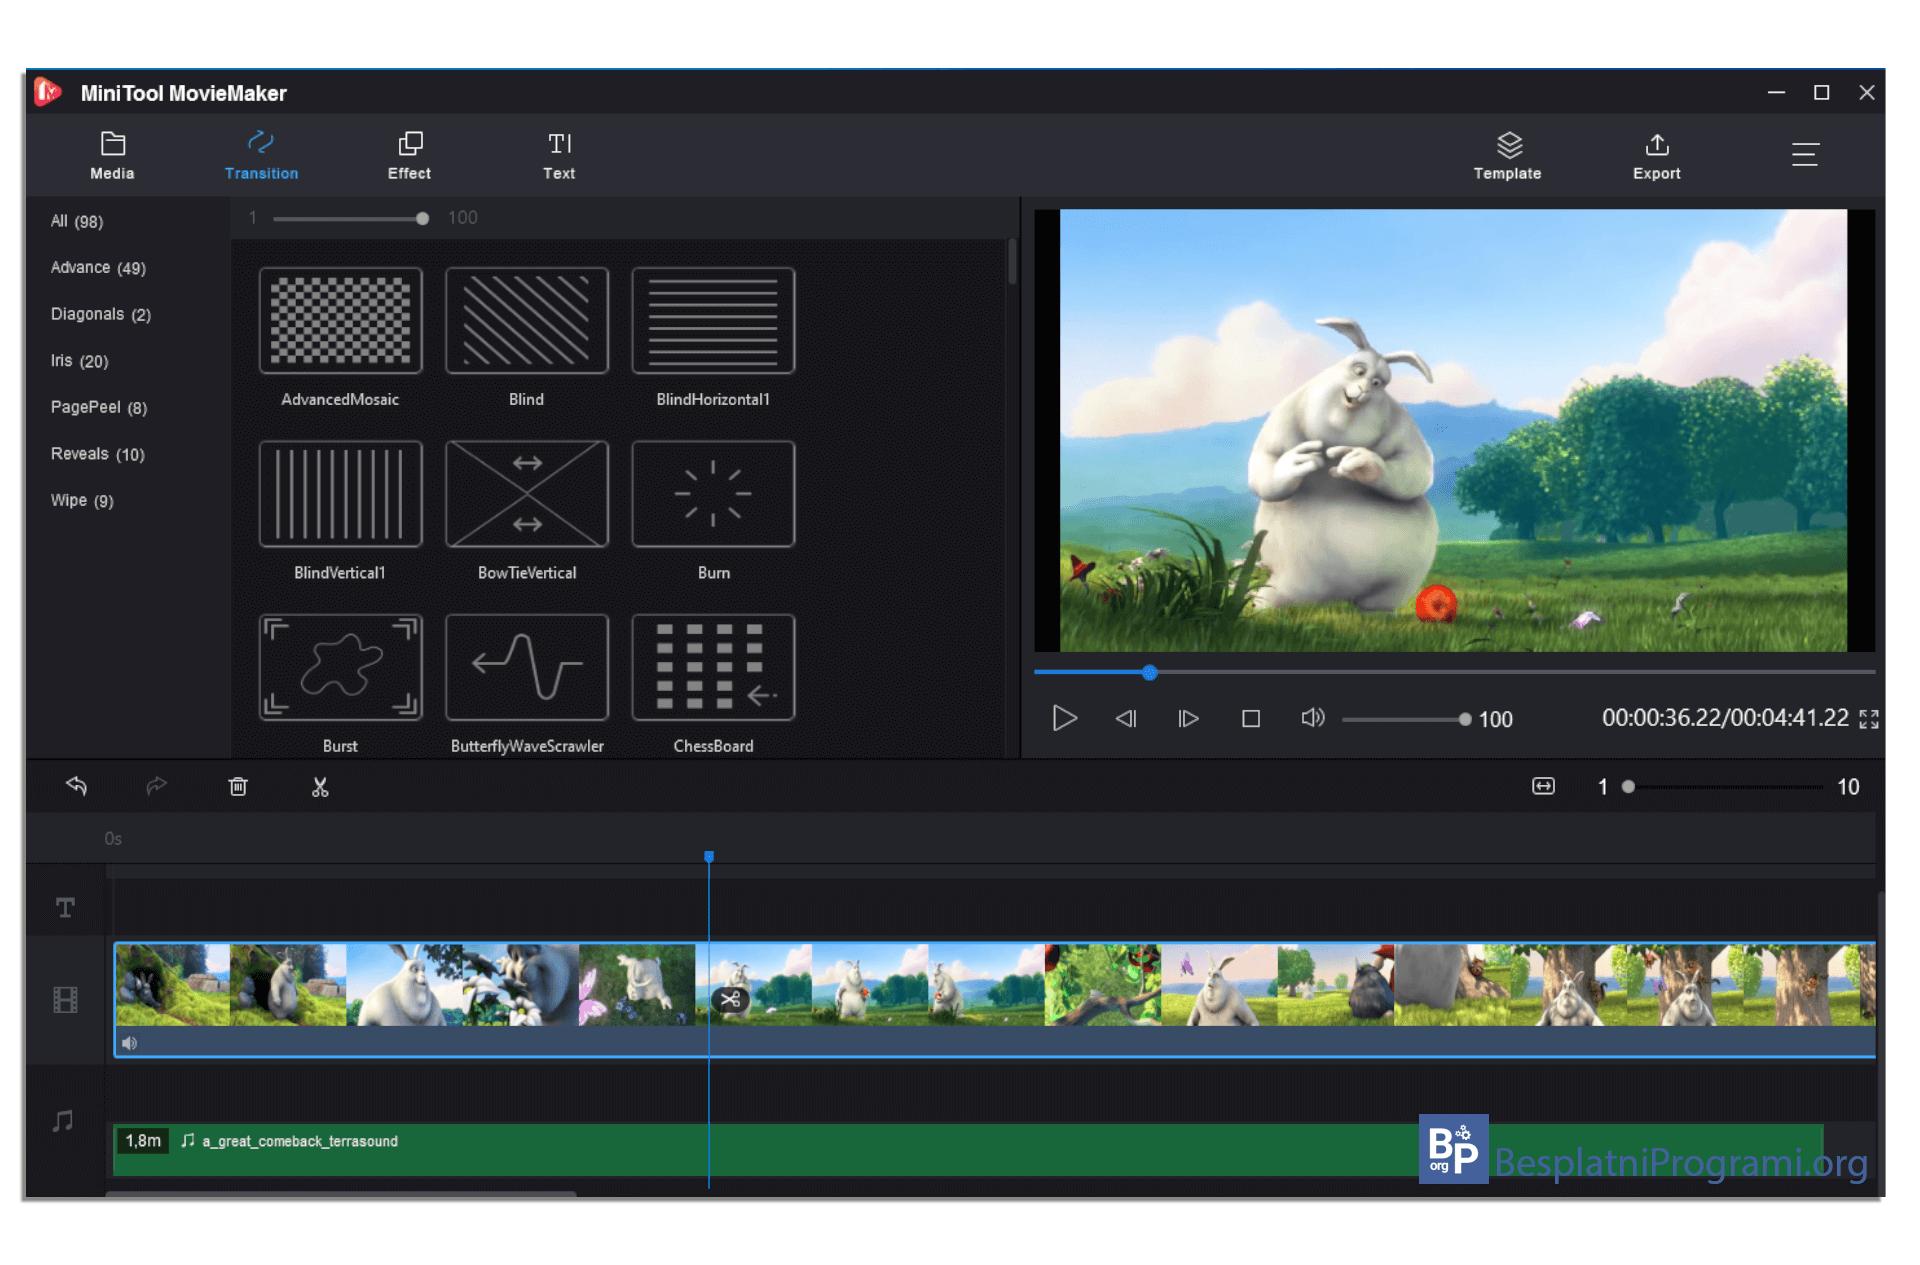 MiniTool MovieMaker tranzicija